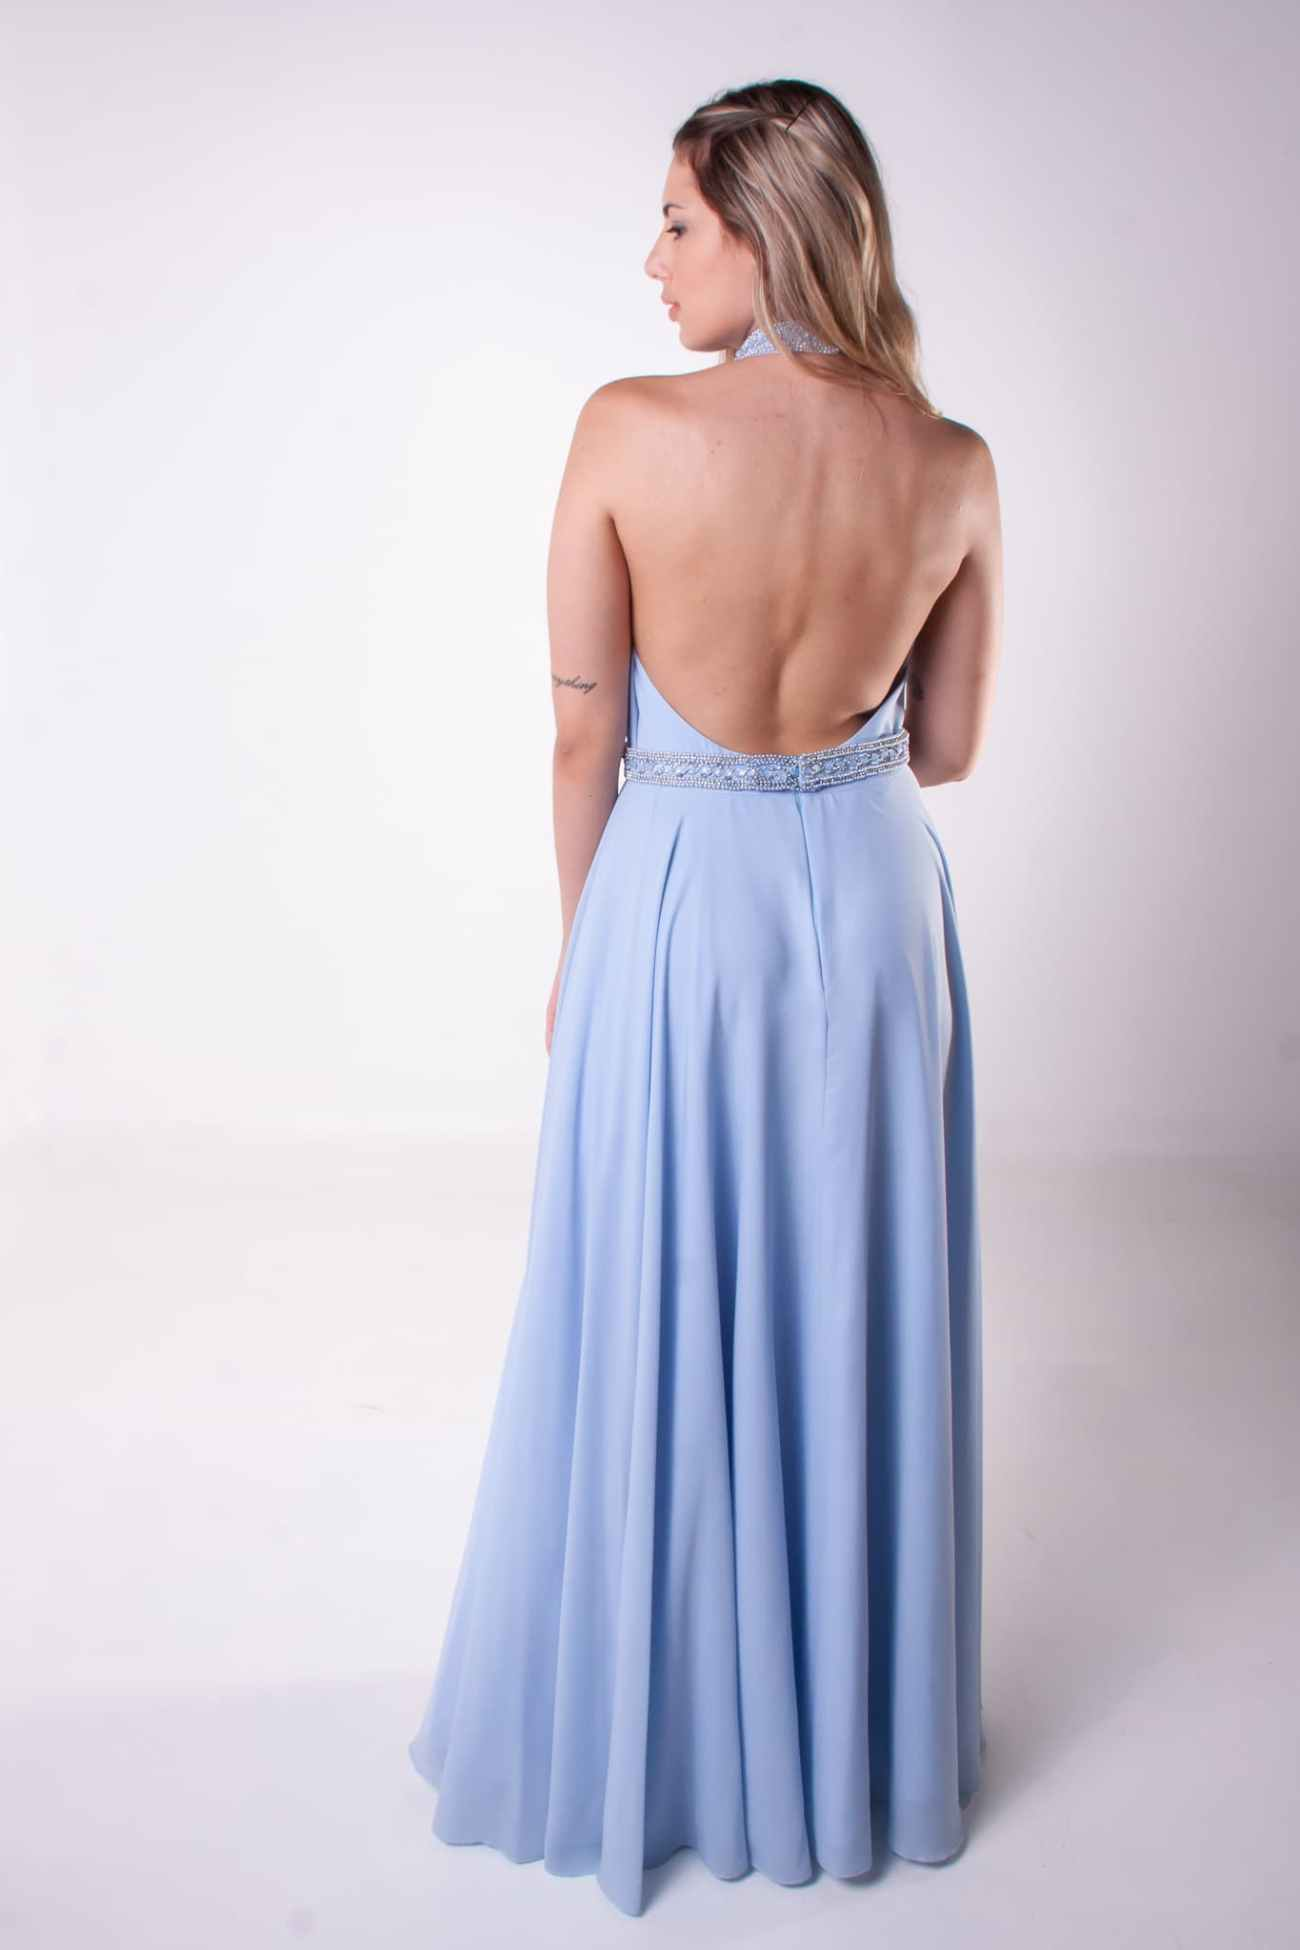 51 - Vestido azul serenity open back com fenda